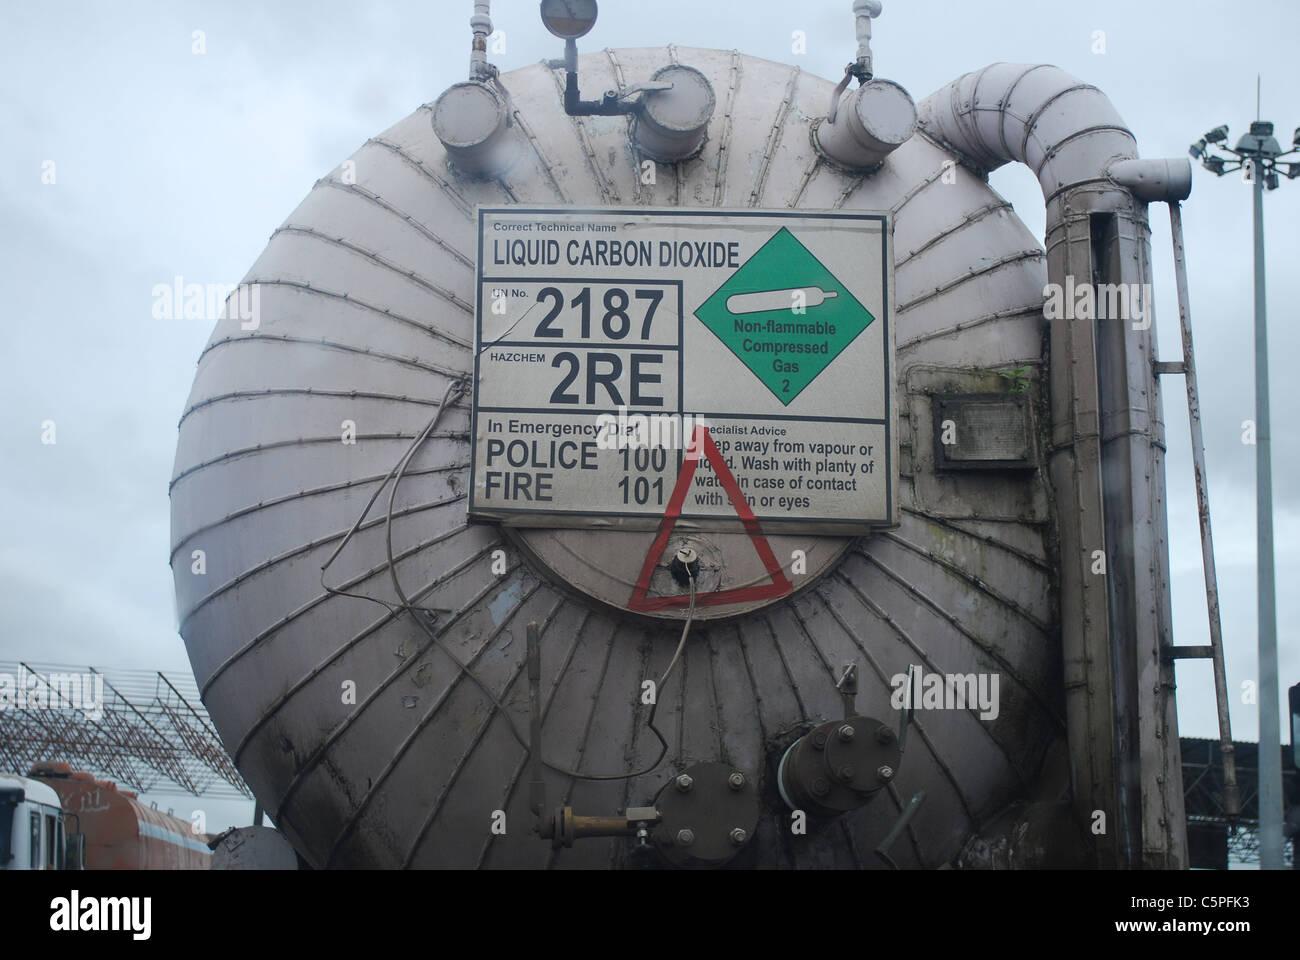 Tanker llevar dióxido de carbono líquido Imagen De Stock